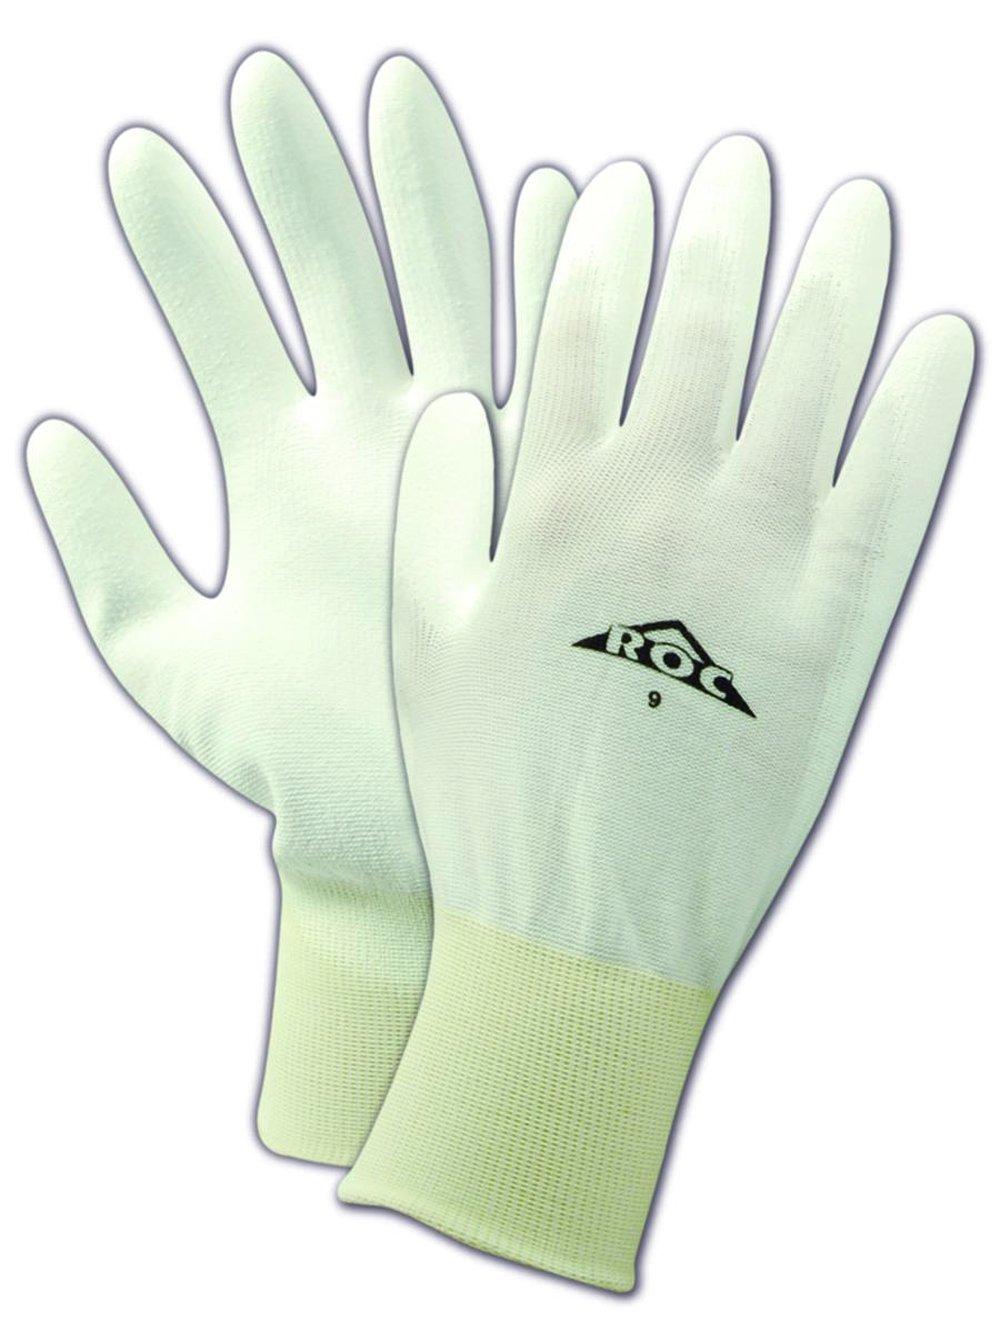 "MAGID ROC PU50 Nylon Glove, Polyurethane Palm Coating, Knit Wrist Cuff, 10"" Length, Size 10 (12 Pair)"